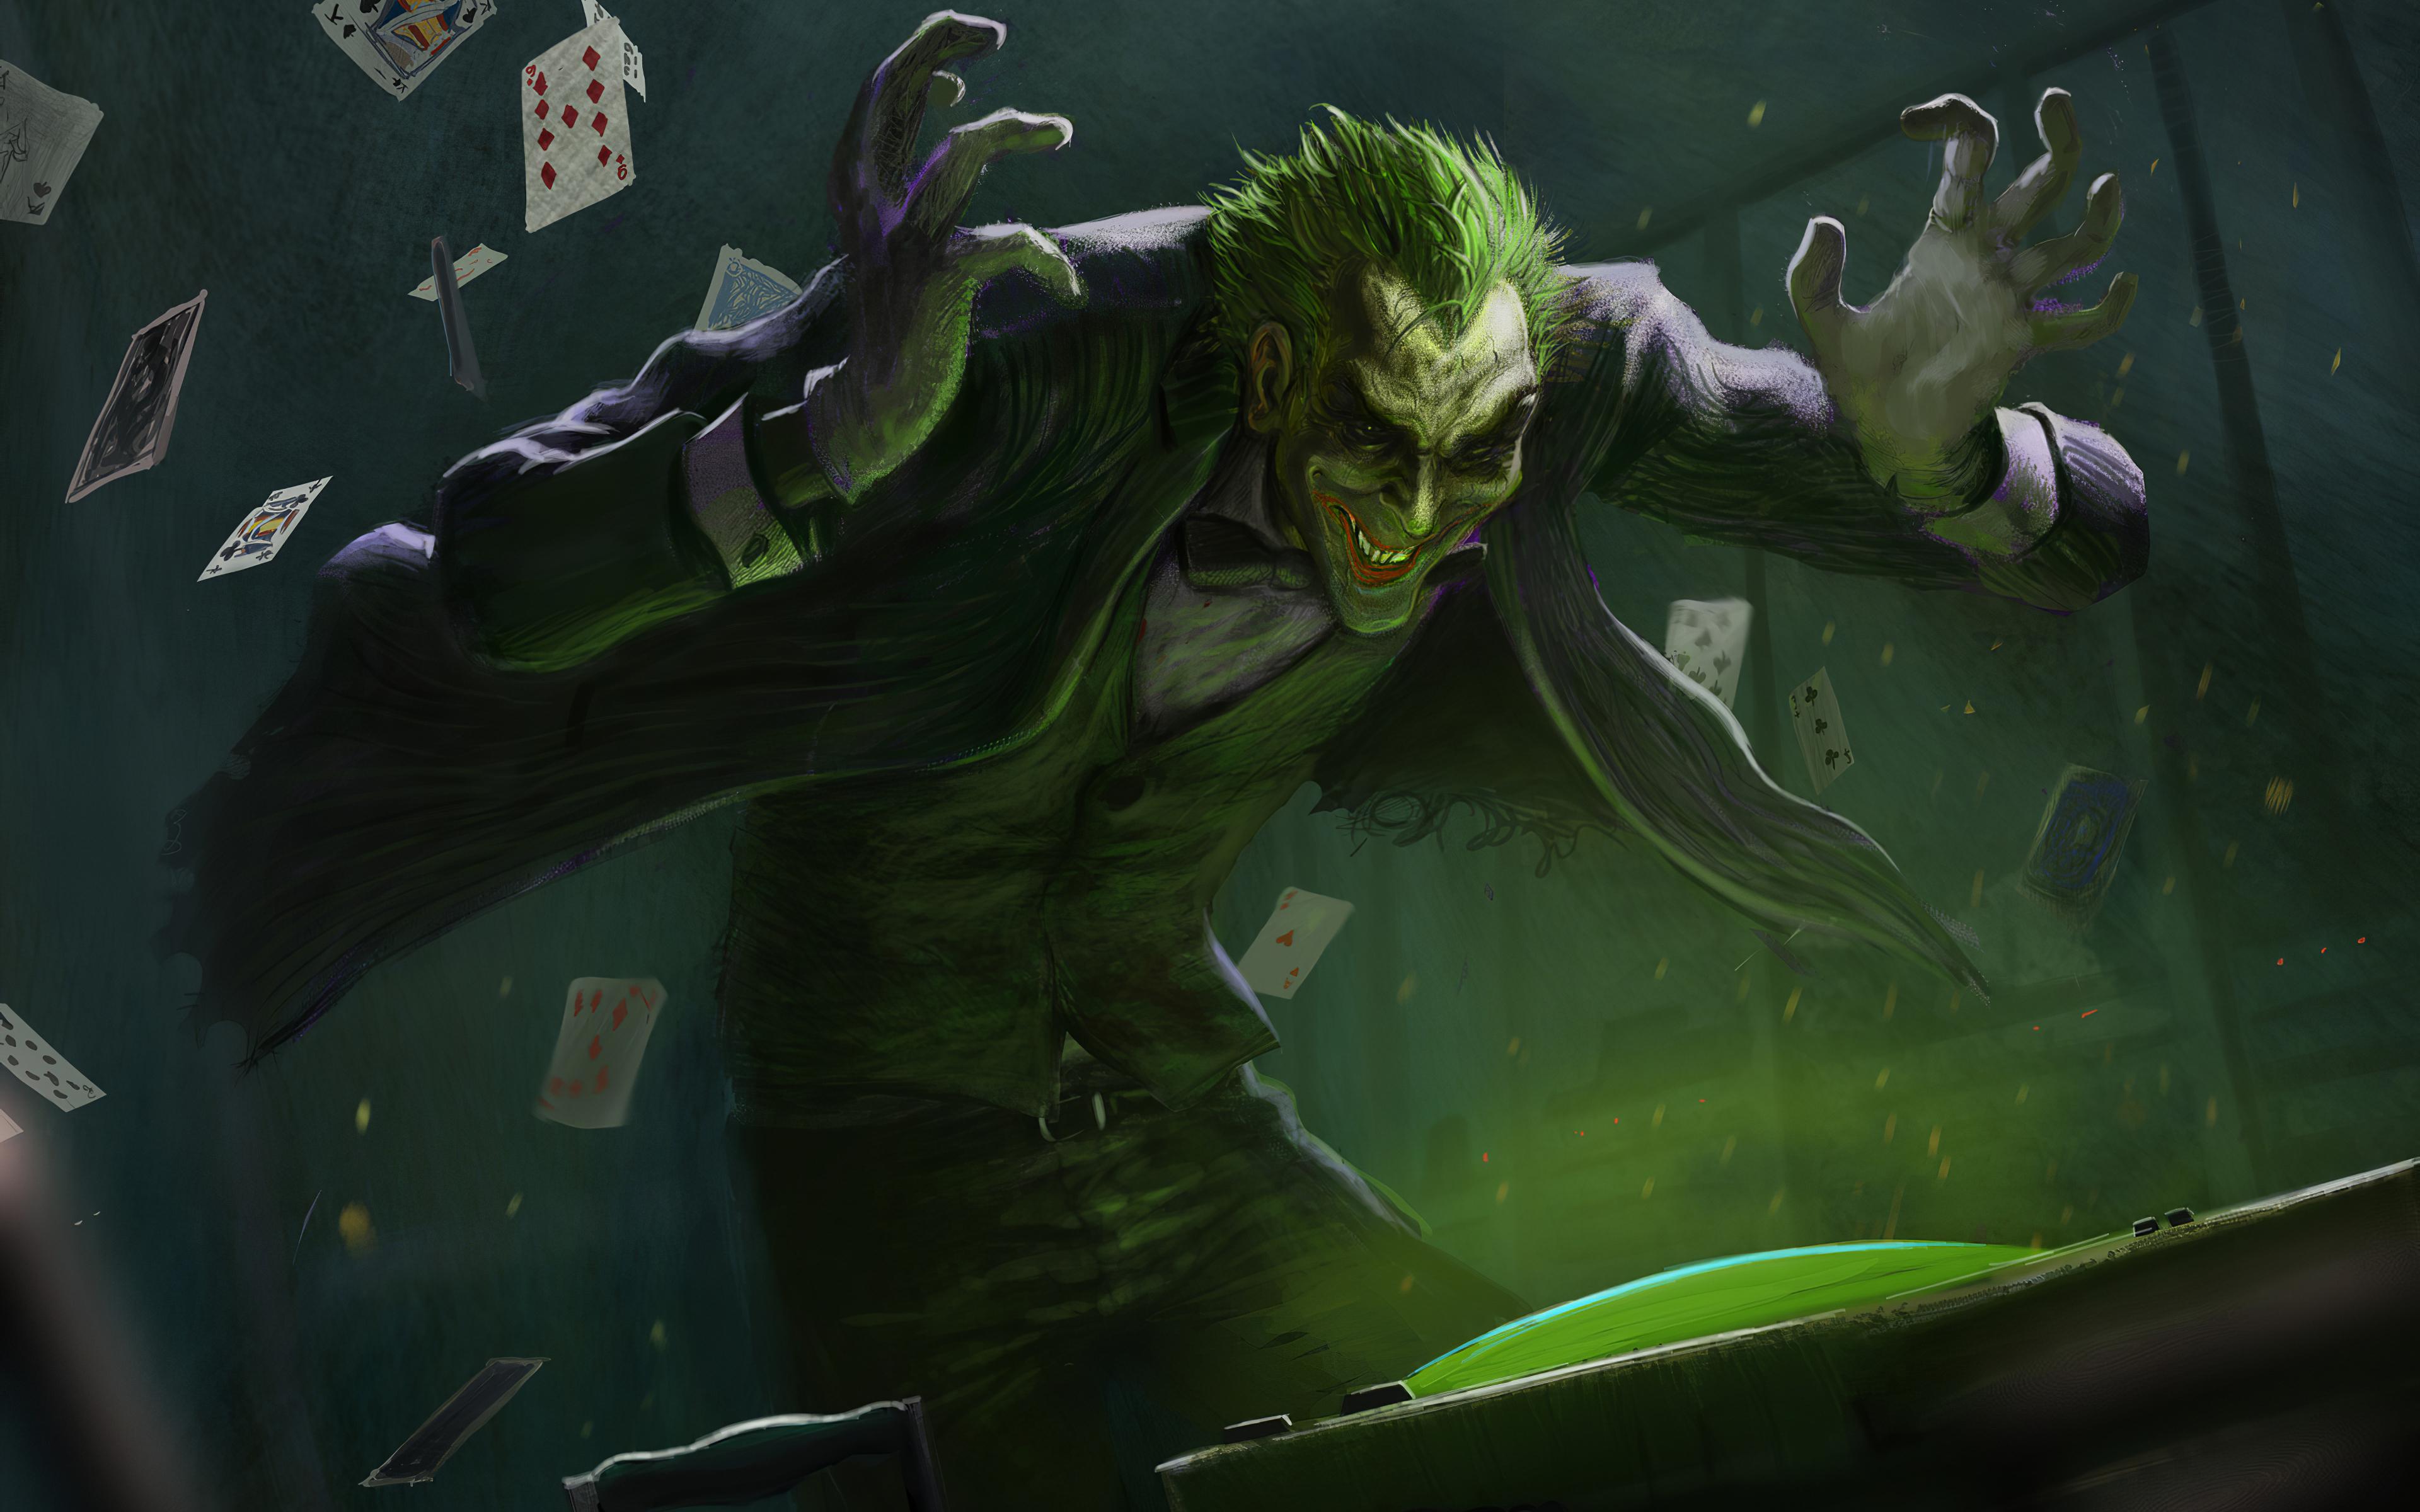 joker-card-up-y1.jpg